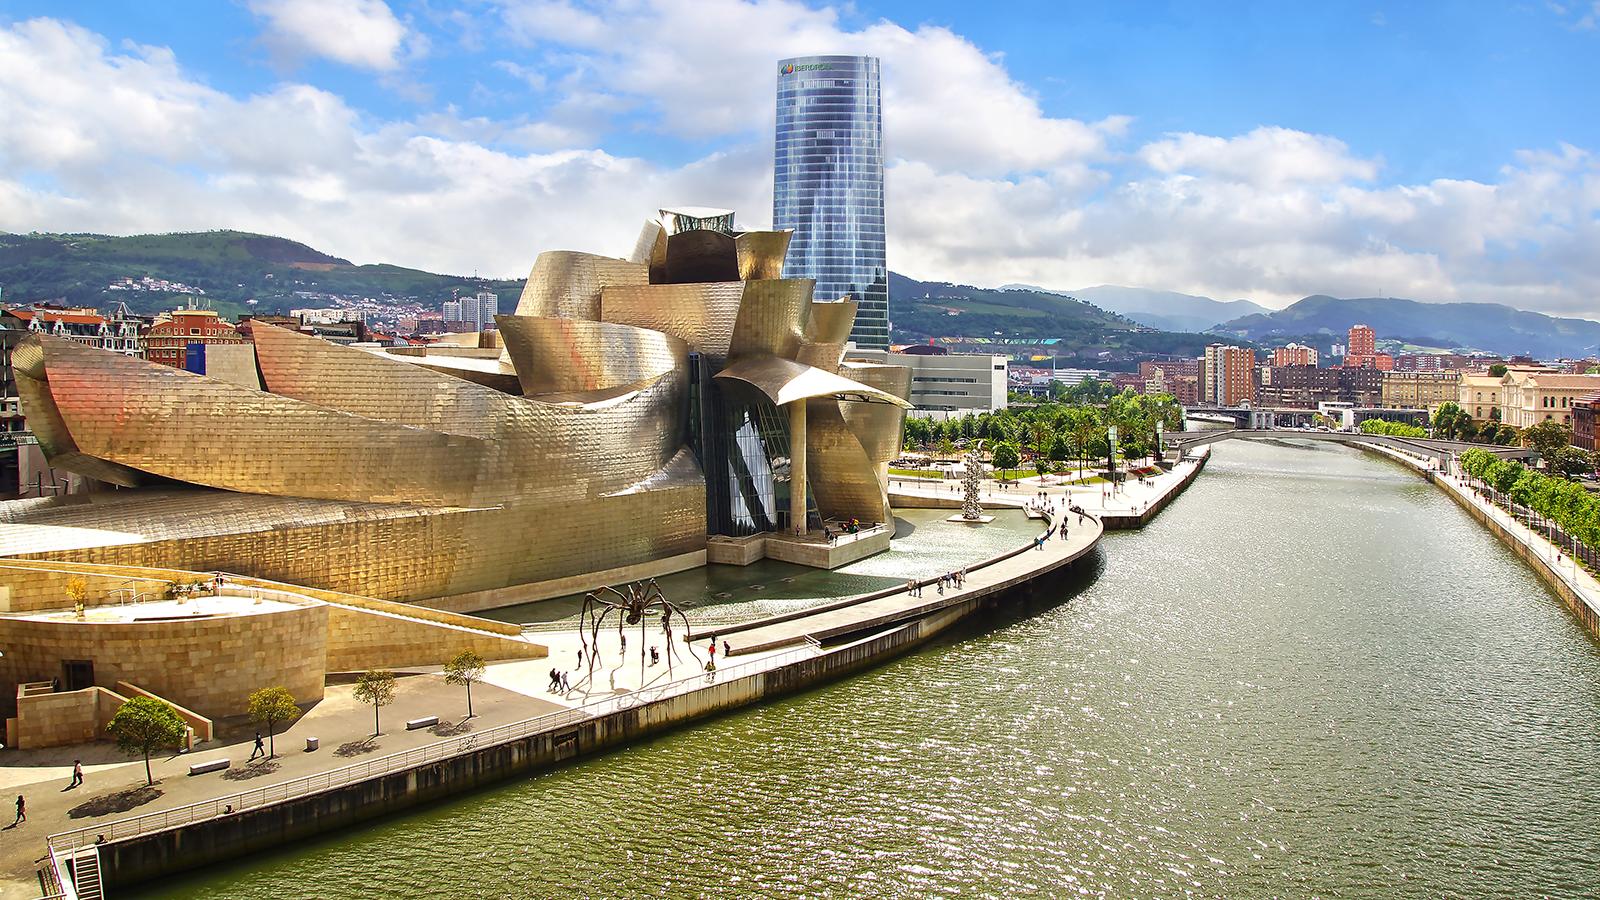 Bilbao - Museu Guggenheim